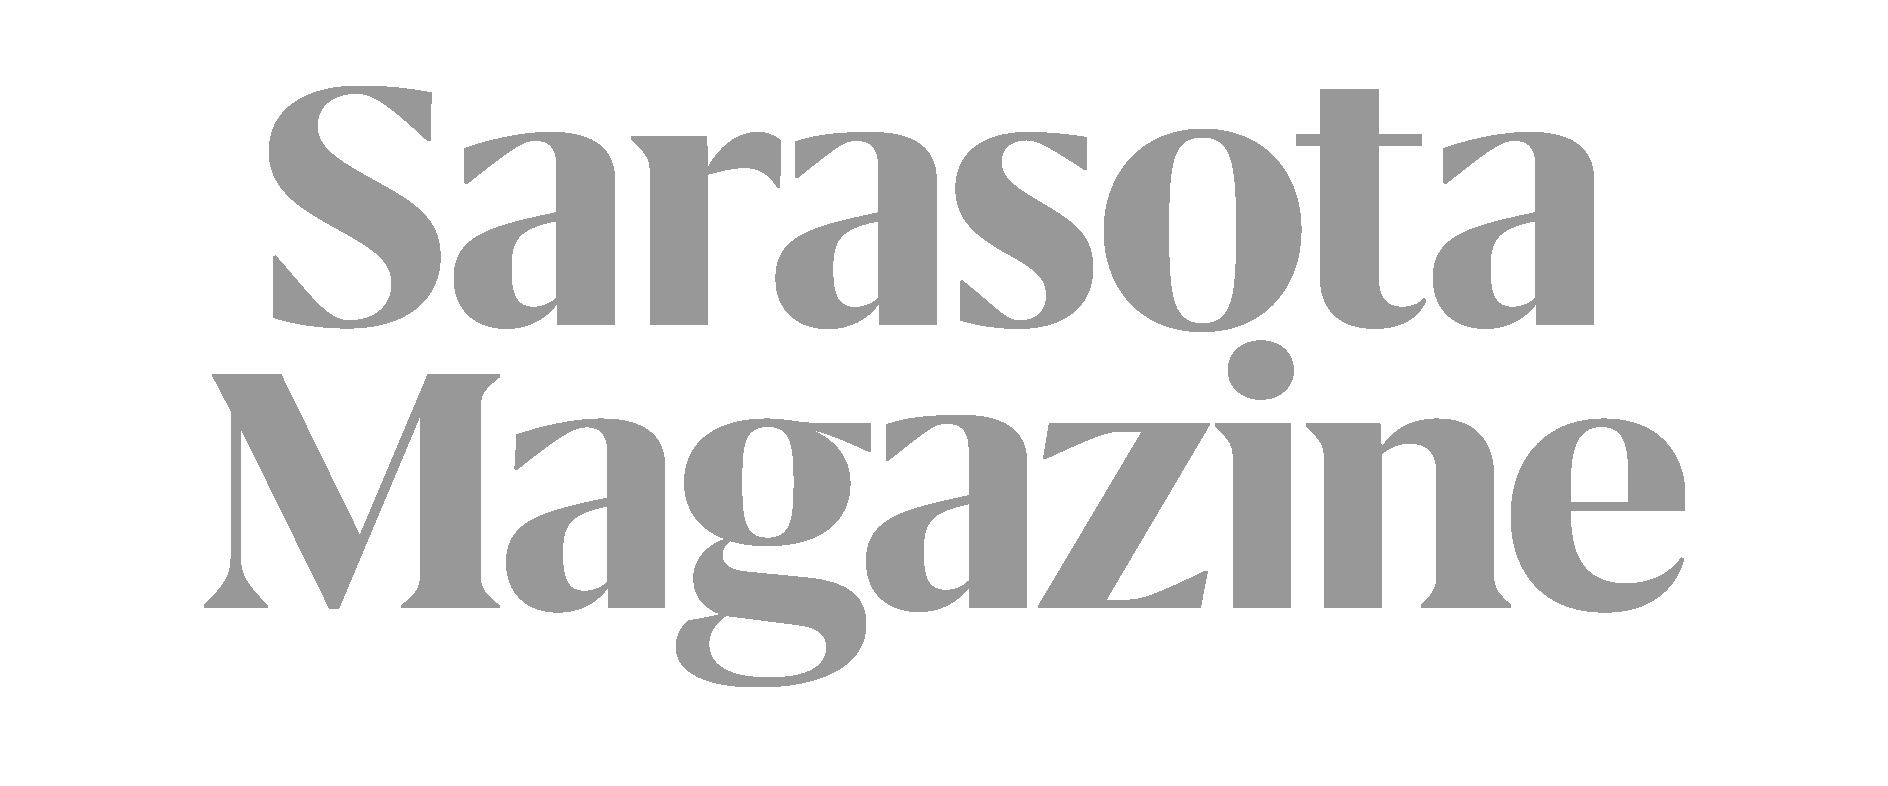 SARASOTA+MAGAZINE+LOGO_STACKEDgrey2.jpg